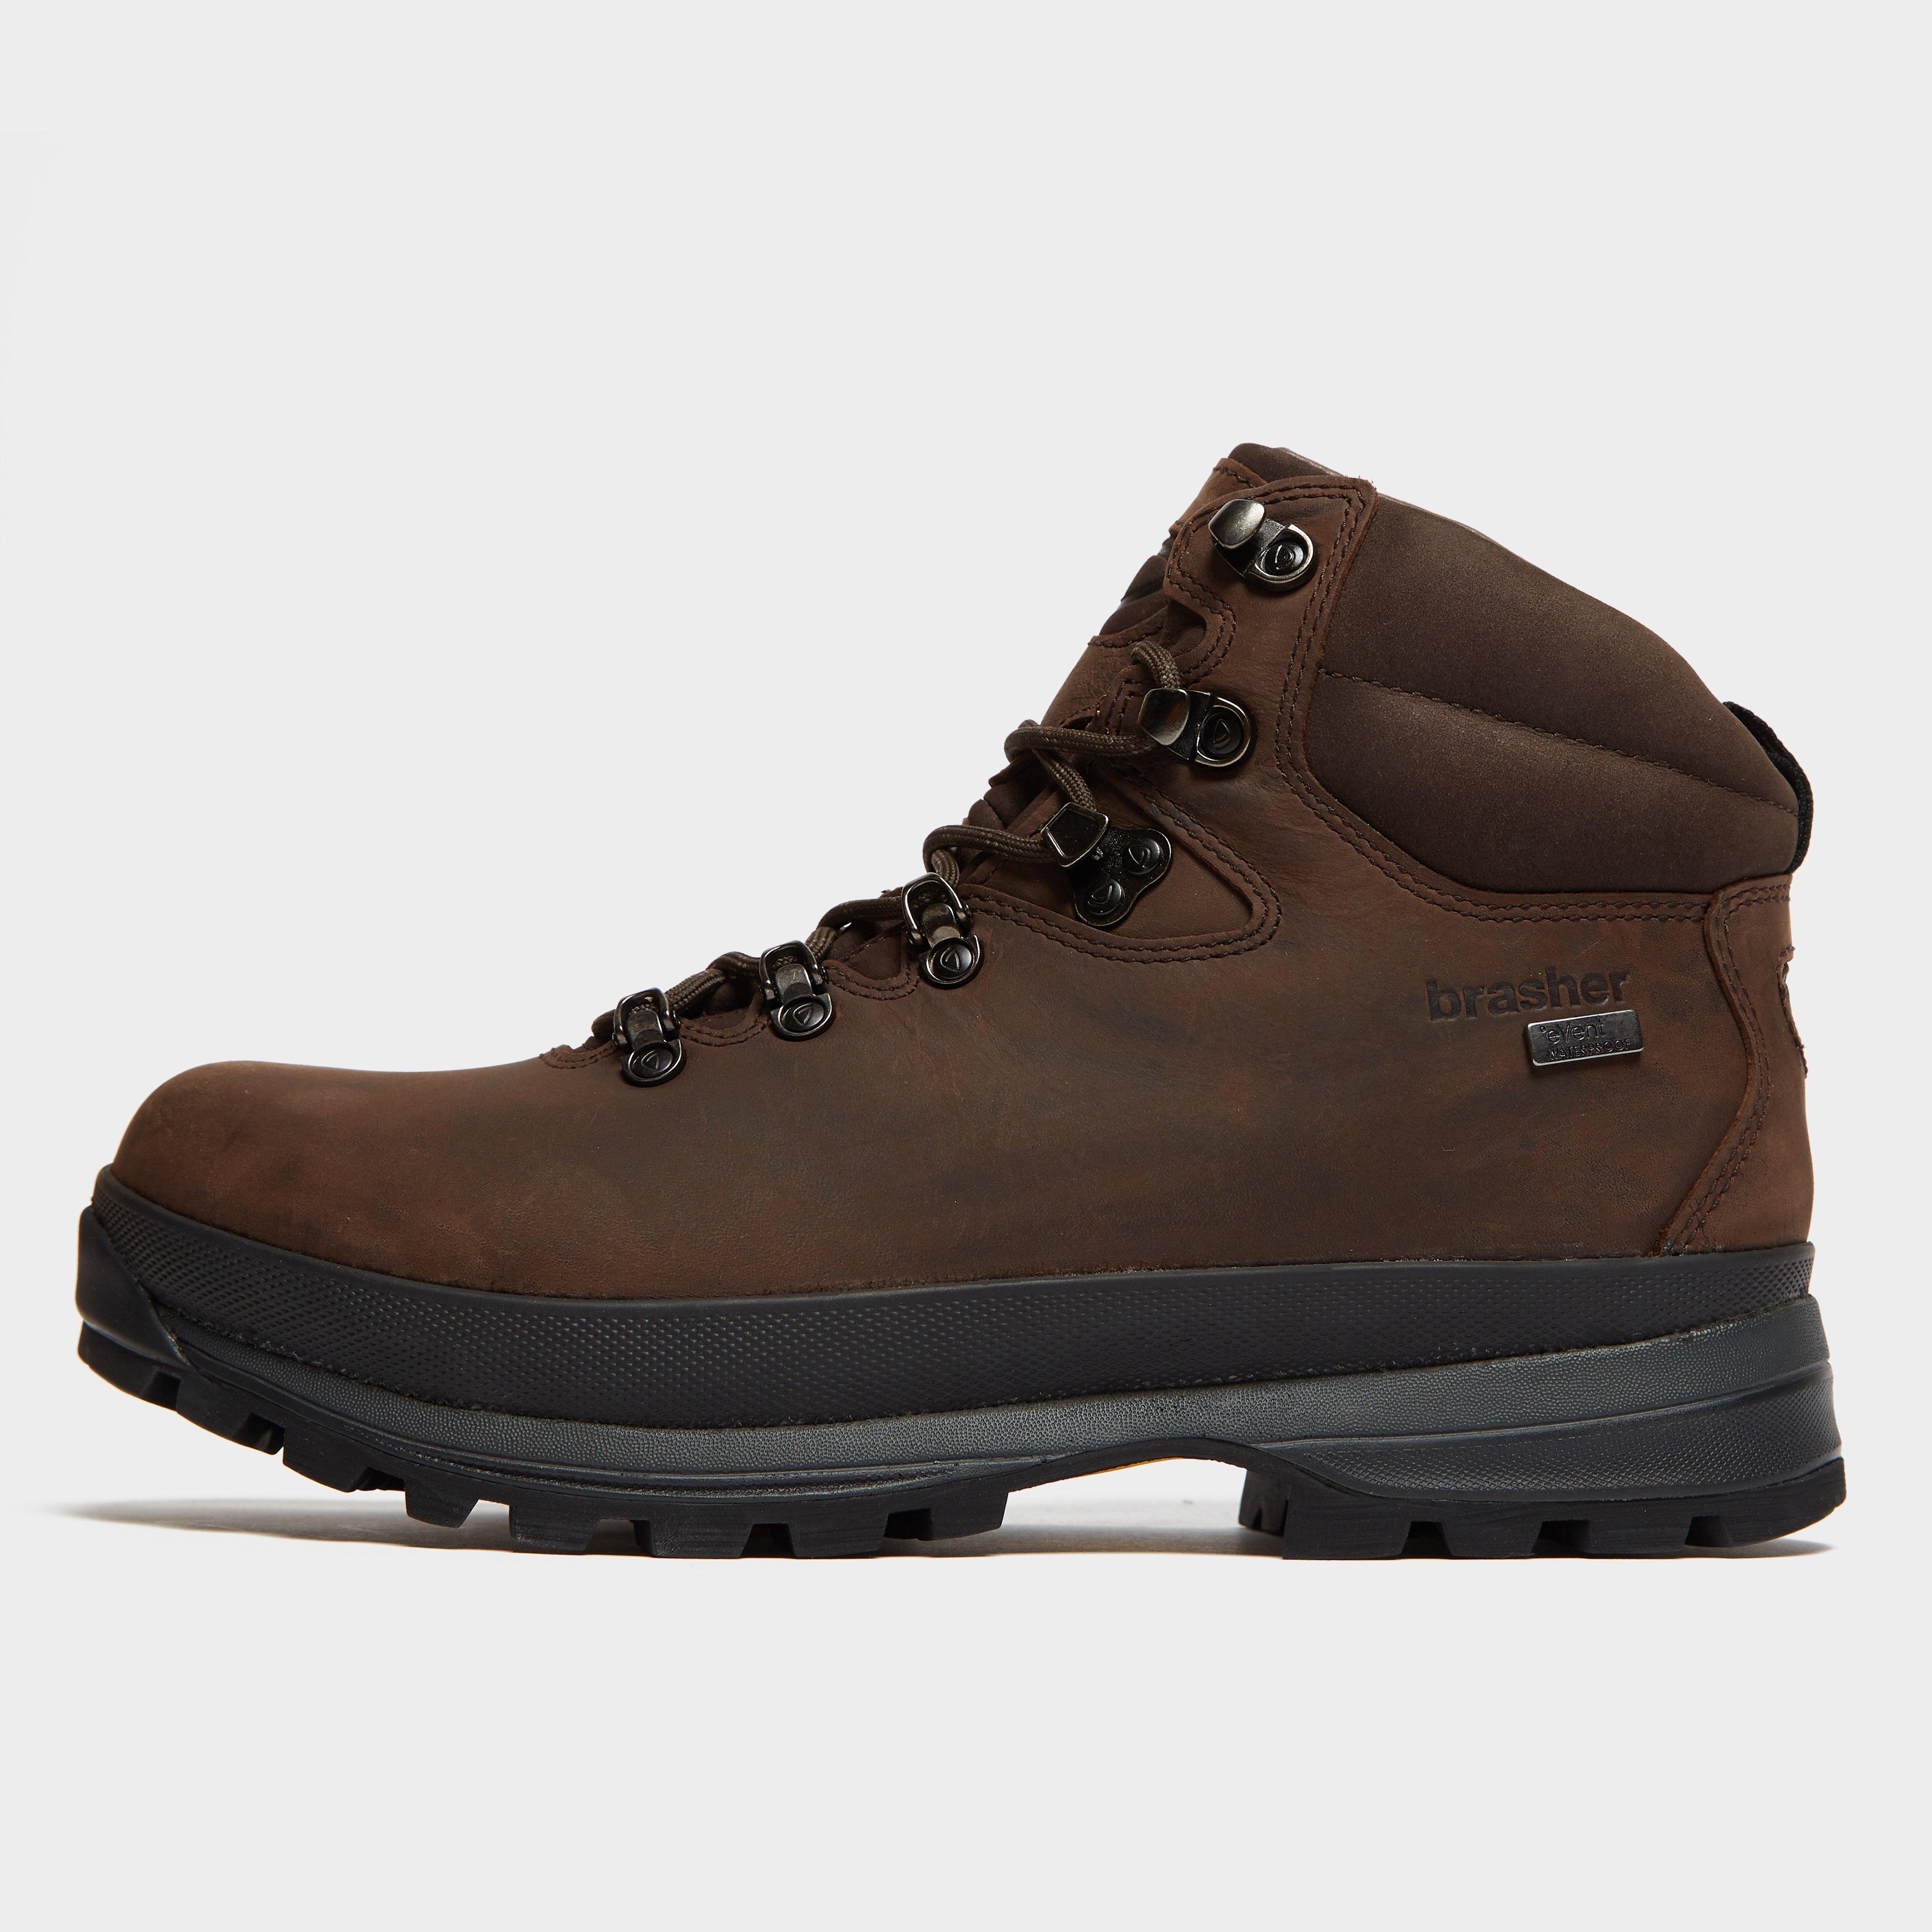 Brasher Mens Country Master Walking Boots - Brown/brn  Brown/brn